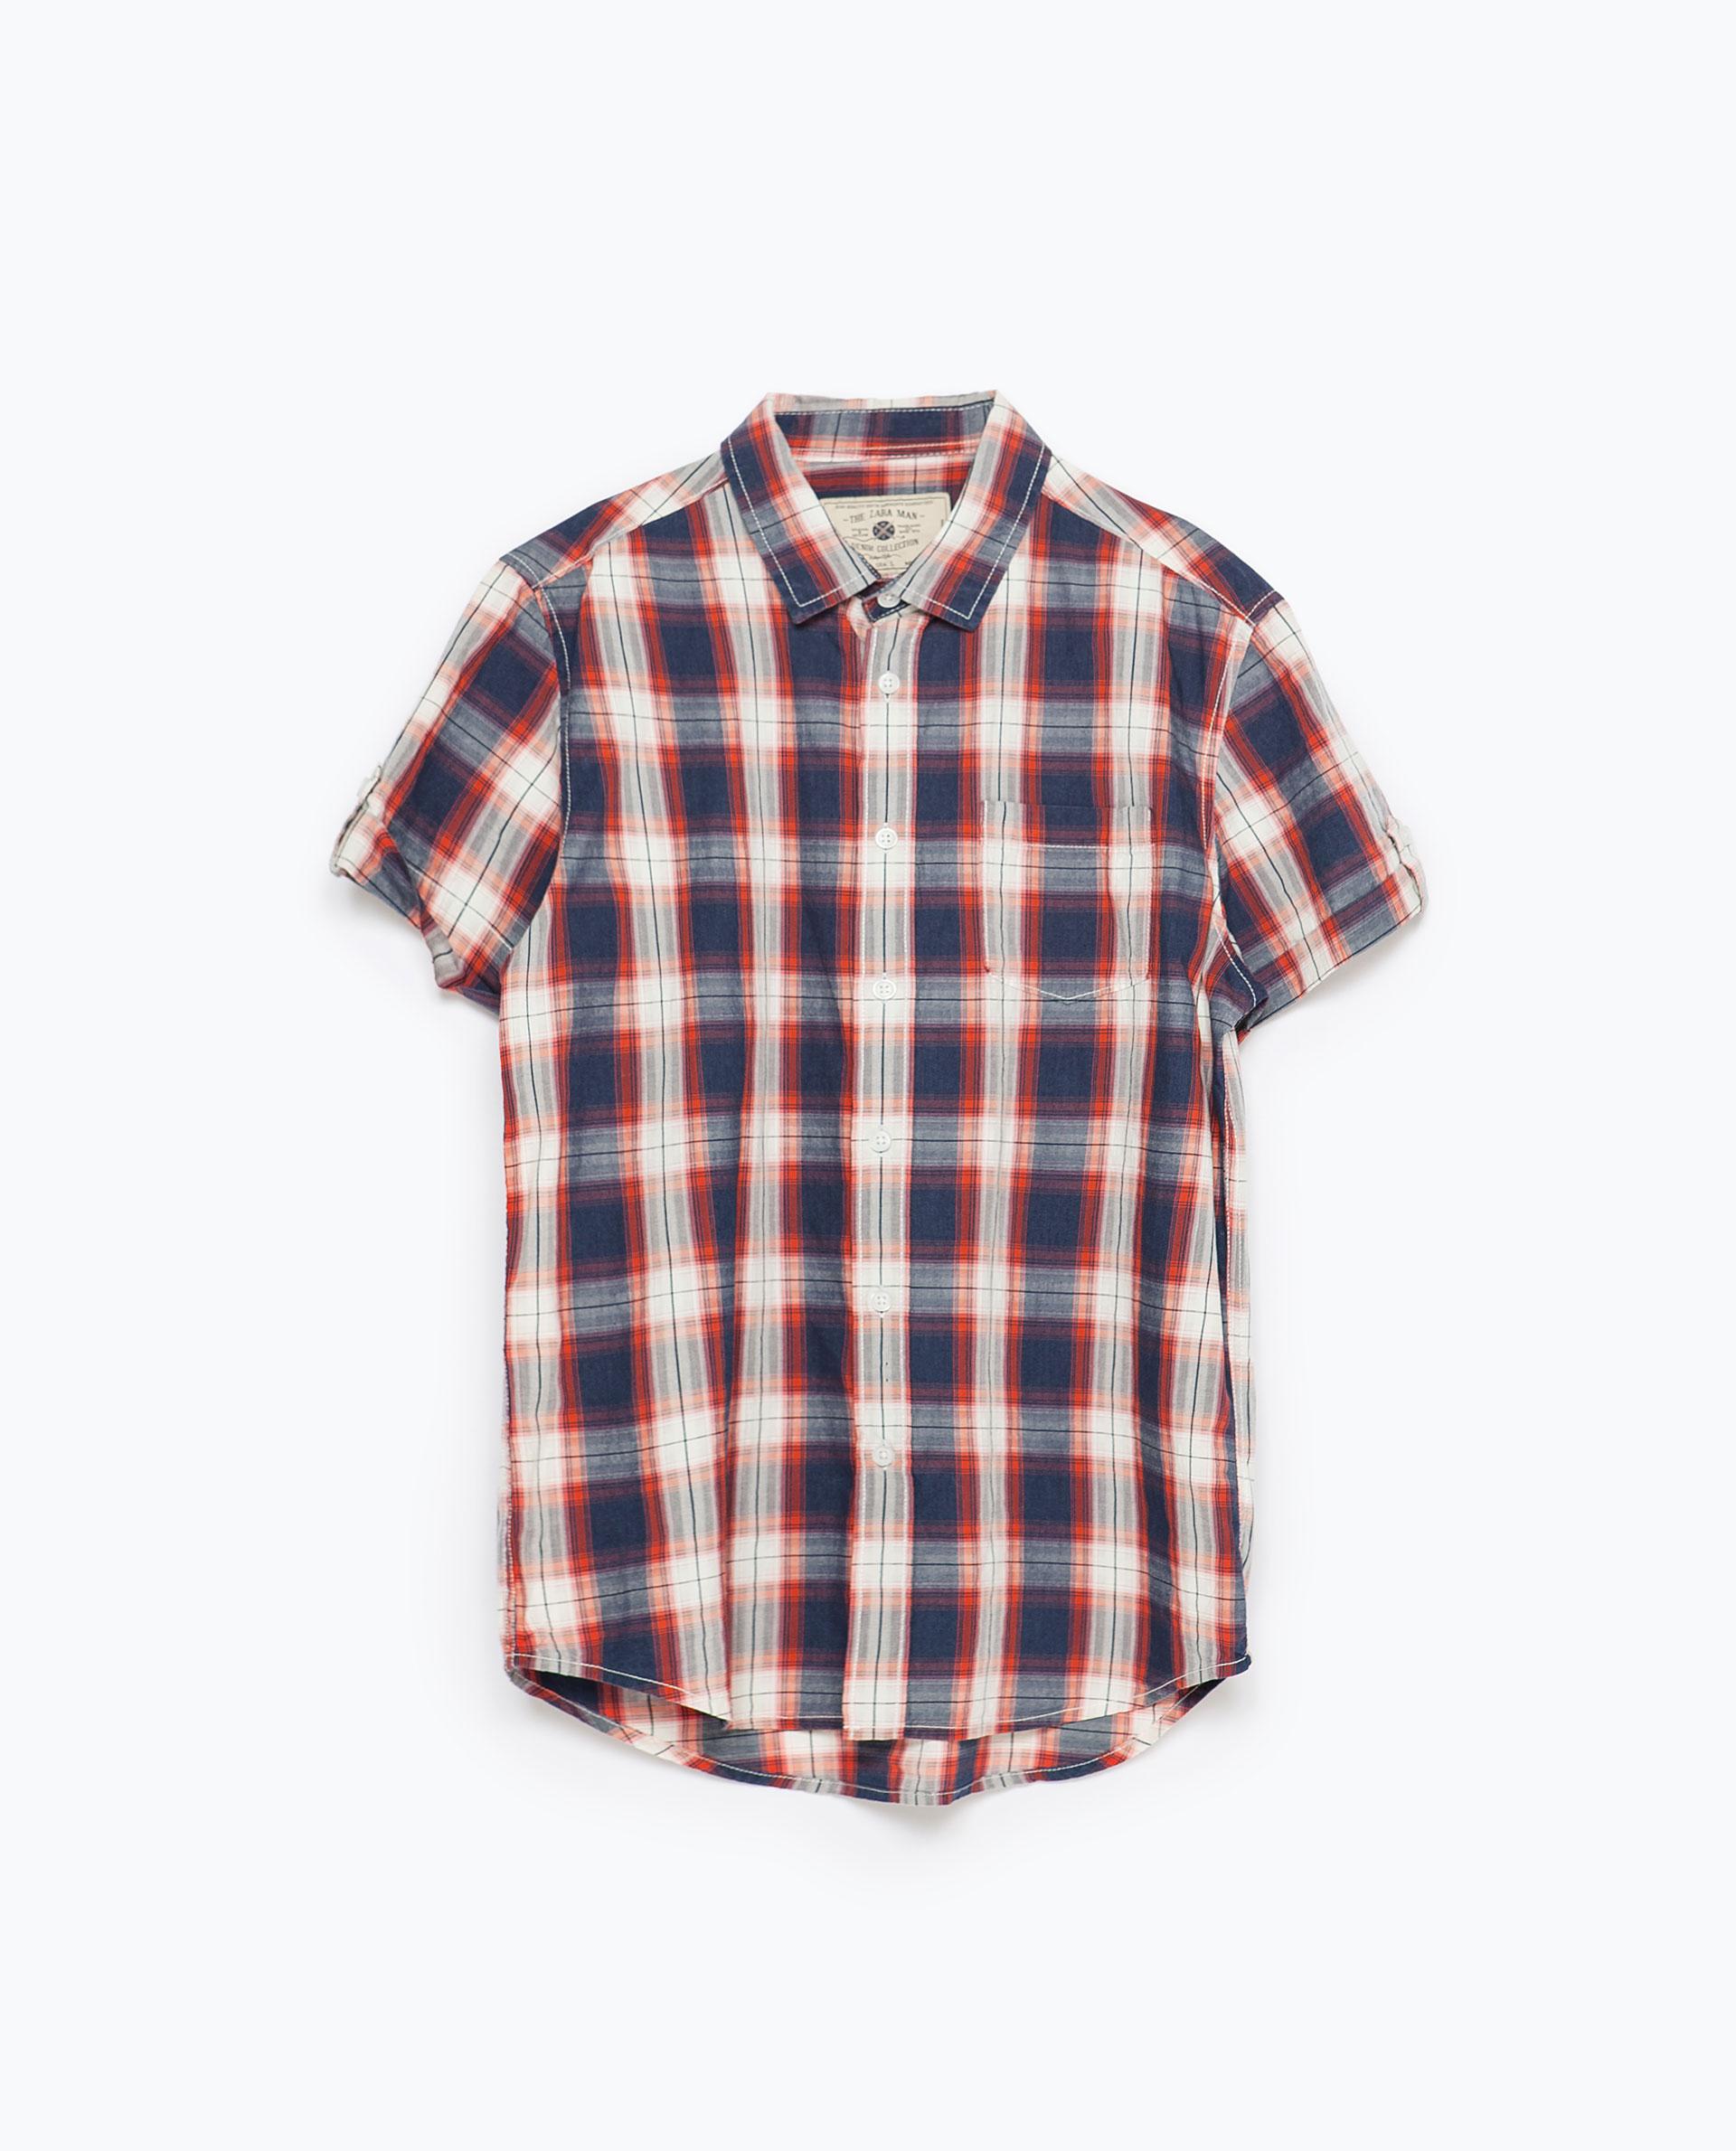 Zara Check Shirt In Orange For Men Lyst